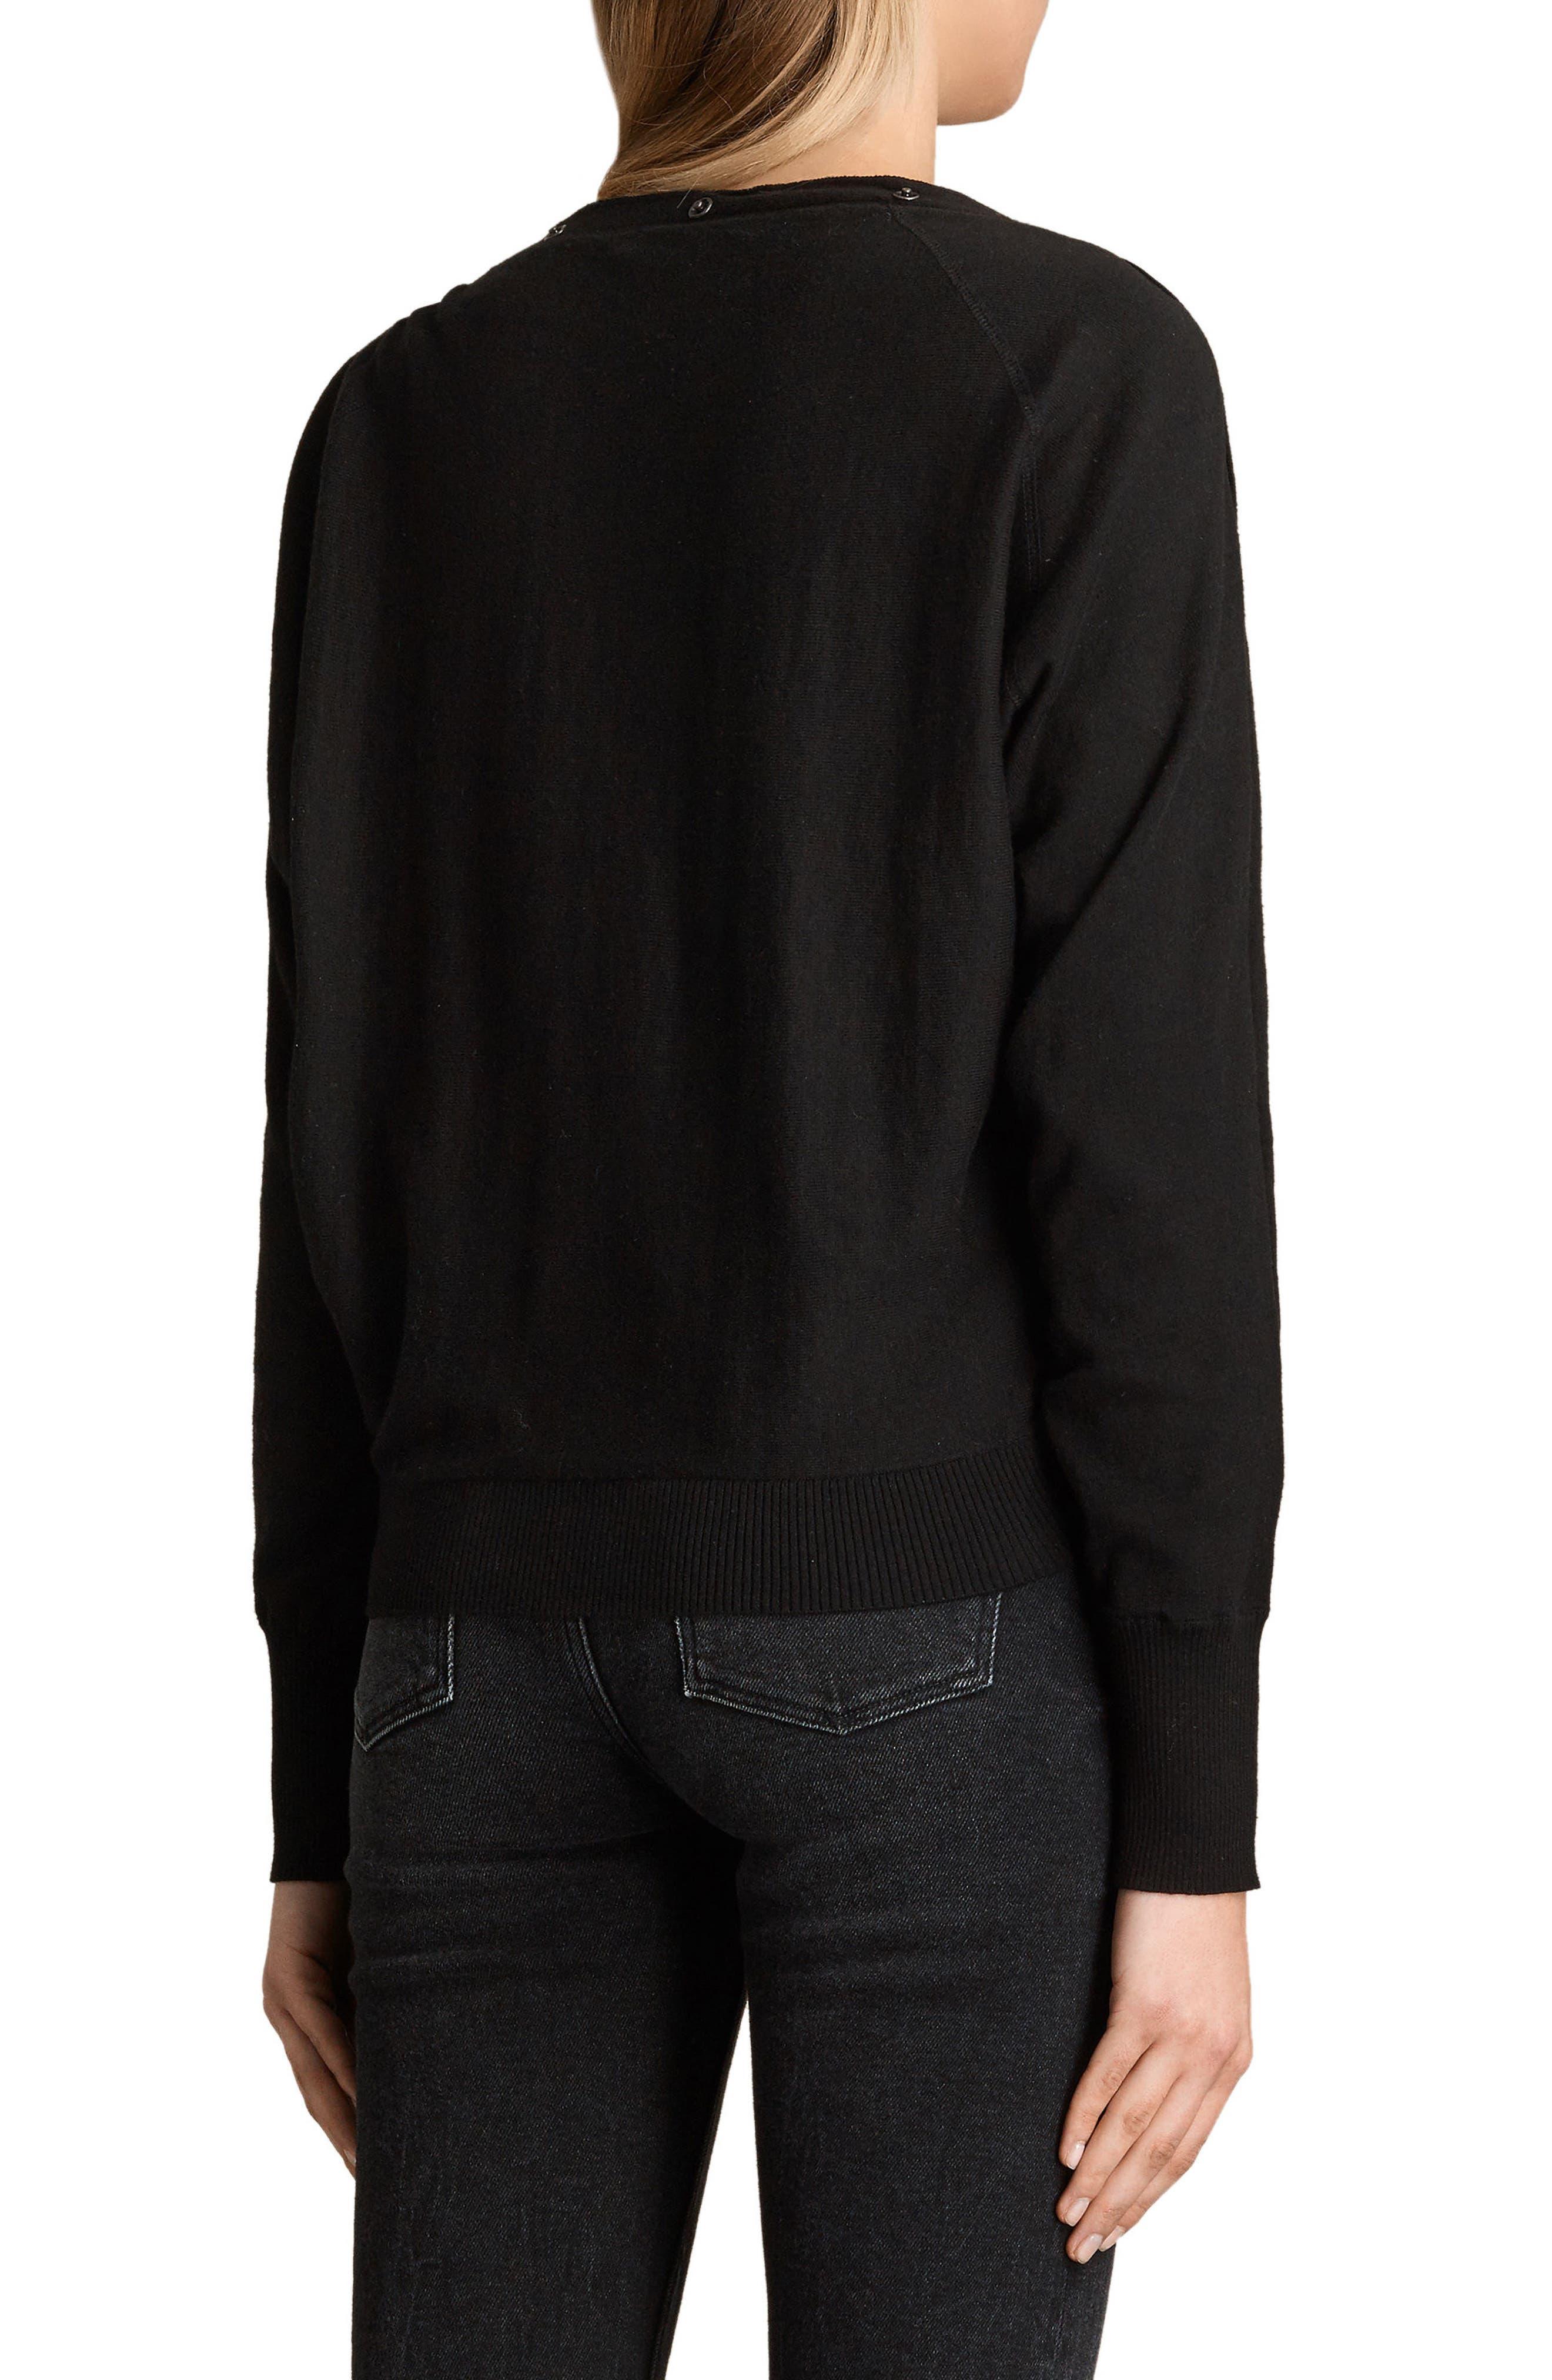 Elle Sweater,                             Alternate thumbnail 2, color,                             Black